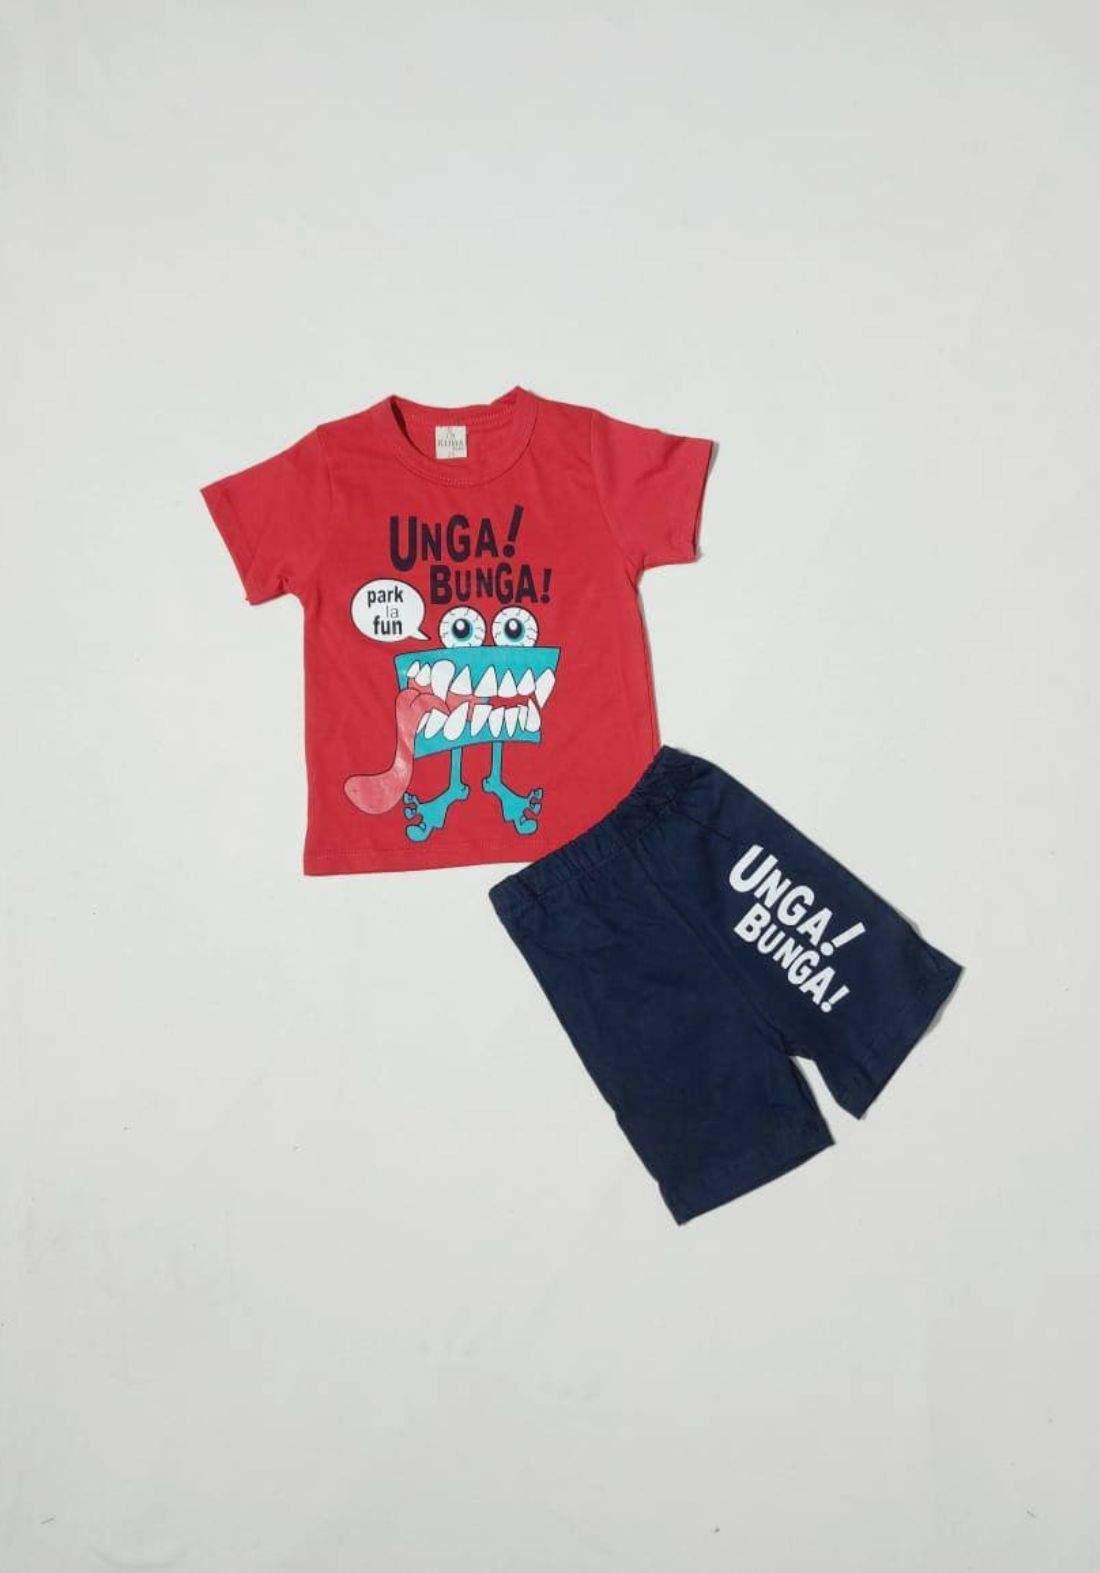 tracksuit for boys red (t-shirt+short) ( تراكسوت ولادي احمر  (شورت و تيشيرت